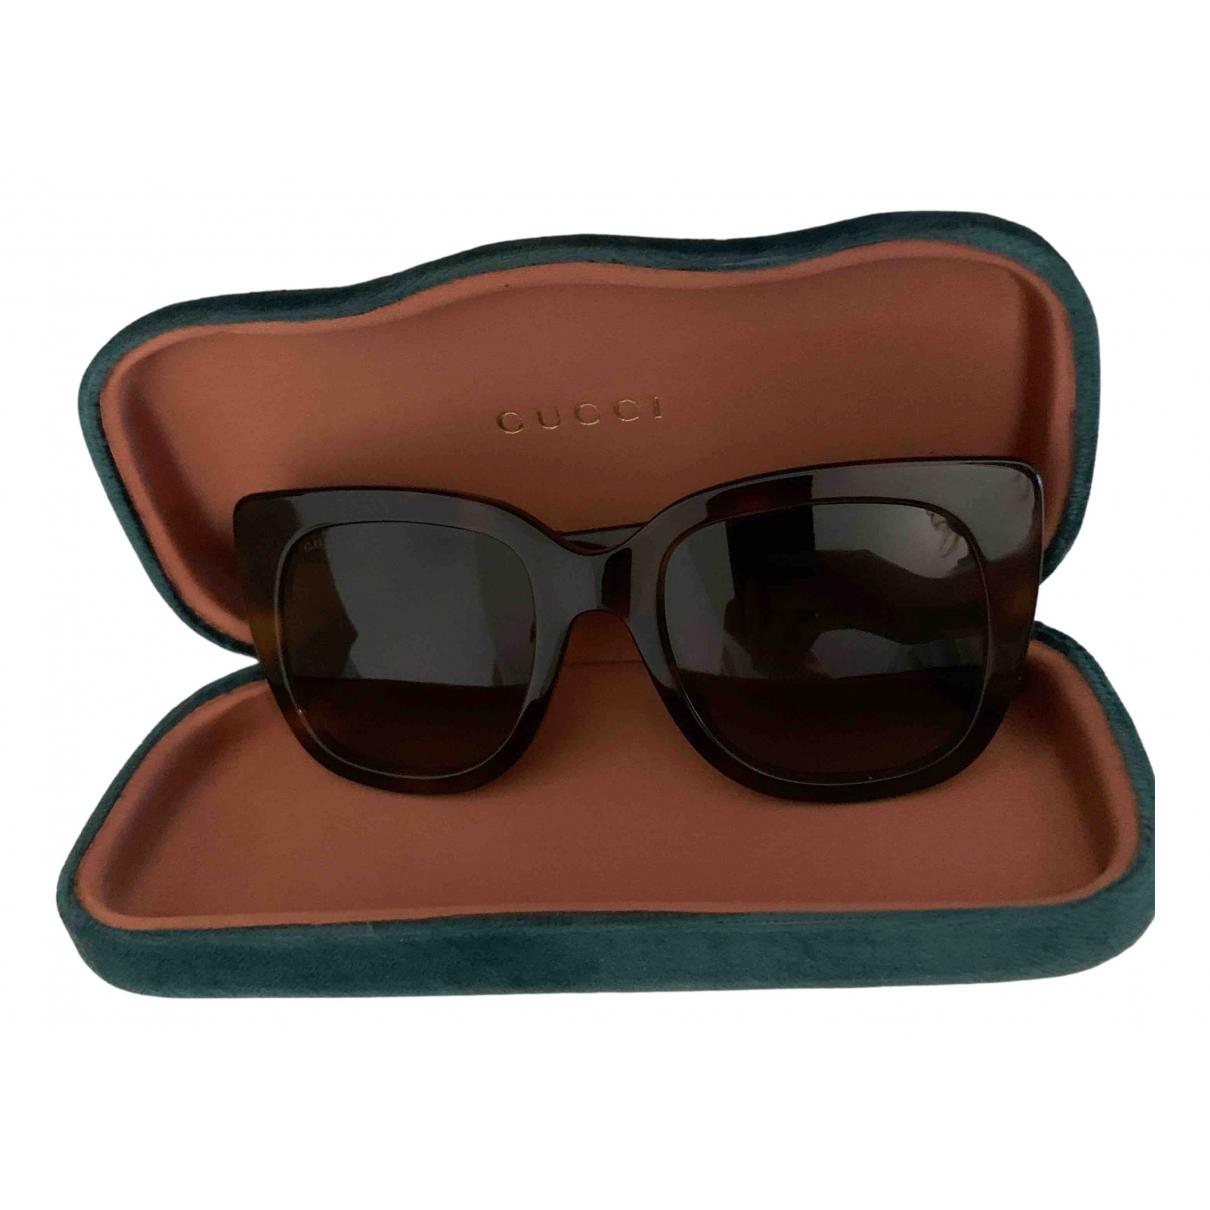 Gucci N Brown Sunglasses for Women N